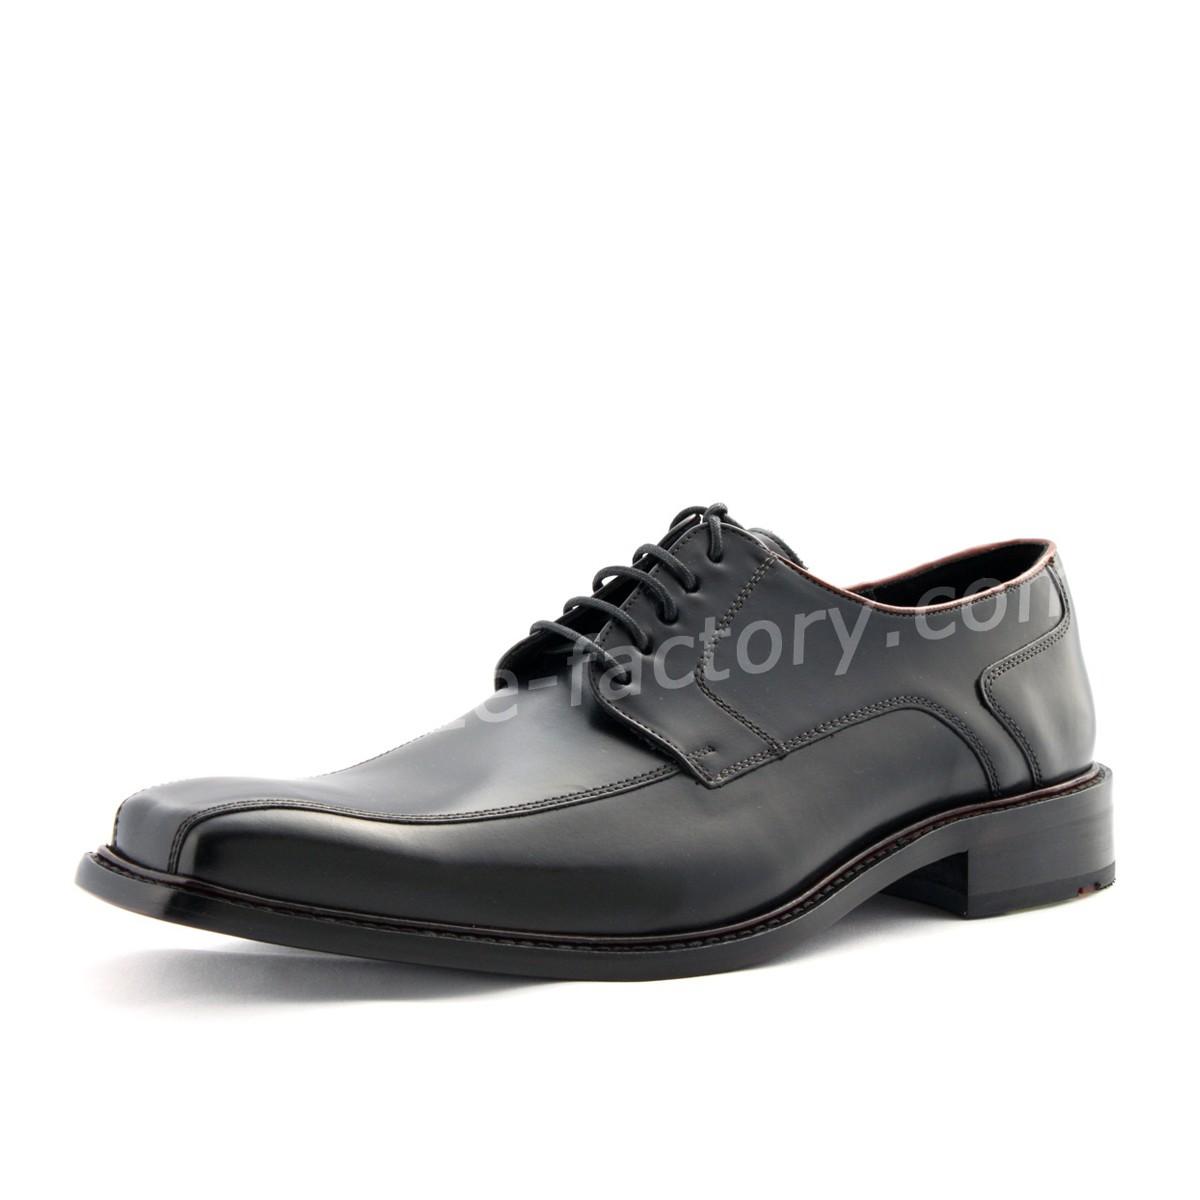 chaussures homme cuir grande taille 45 46 47 48 49 49 50 lloyd lloyd. Black Bedroom Furniture Sets. Home Design Ideas